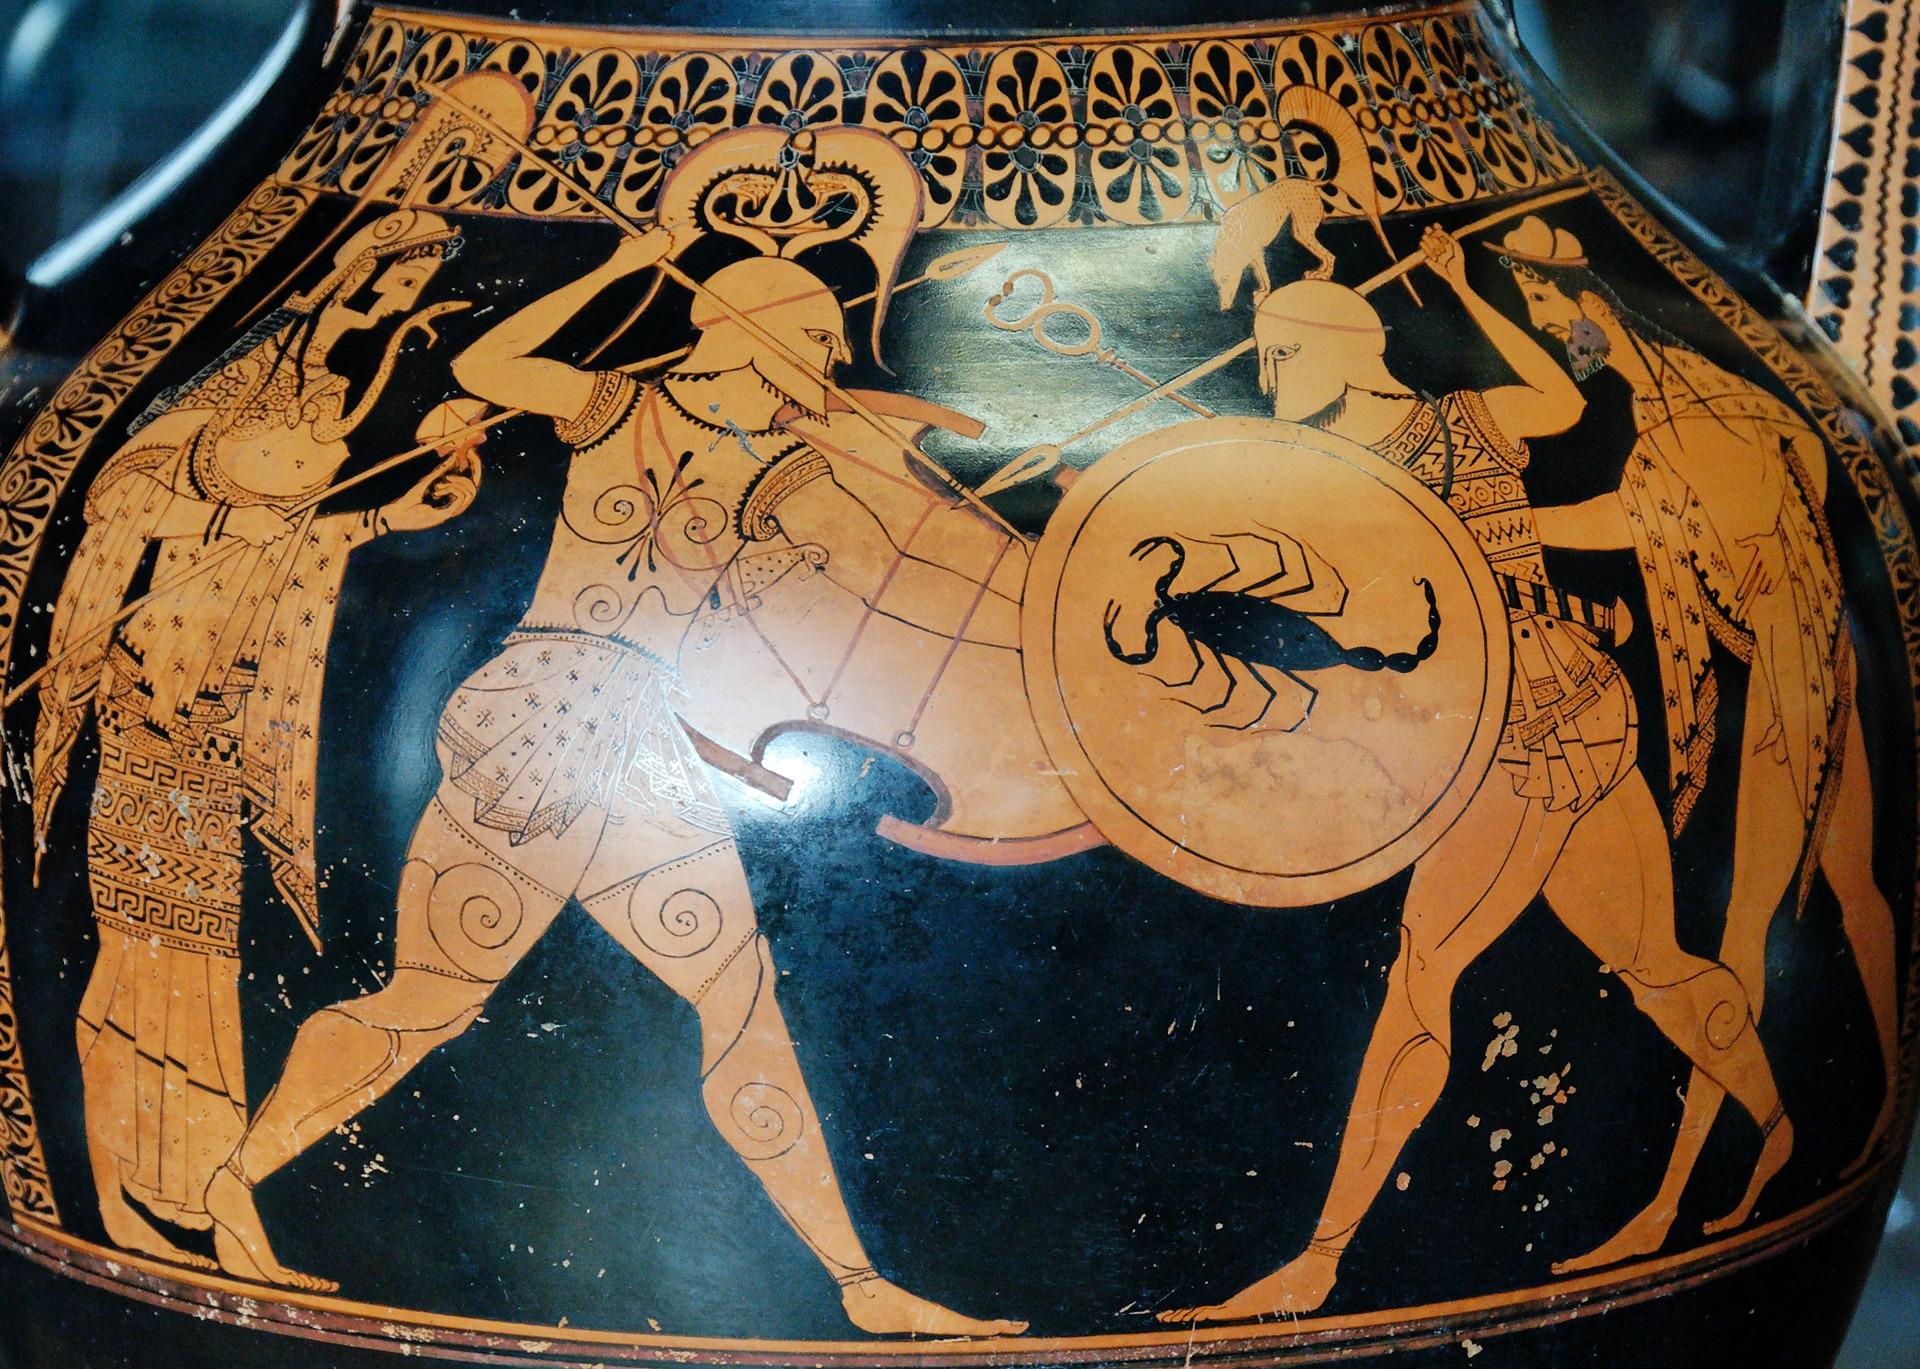 "Attisch-rotfigurige Bauchamphora, um 520 v. Chr., Ton, Höhe des Objektes 57,2 cm, Paris, Musée du Louvre, Inv.-Nr. G 1.<br> Quelle: <a href=""https://commons.wikimedia.org/wiki/File:Fight_Andokides_Louvre_G1.jpg"">User:Jastrow / Wikimedia Commons</a><br>Lizenz: Gemeinfrei"